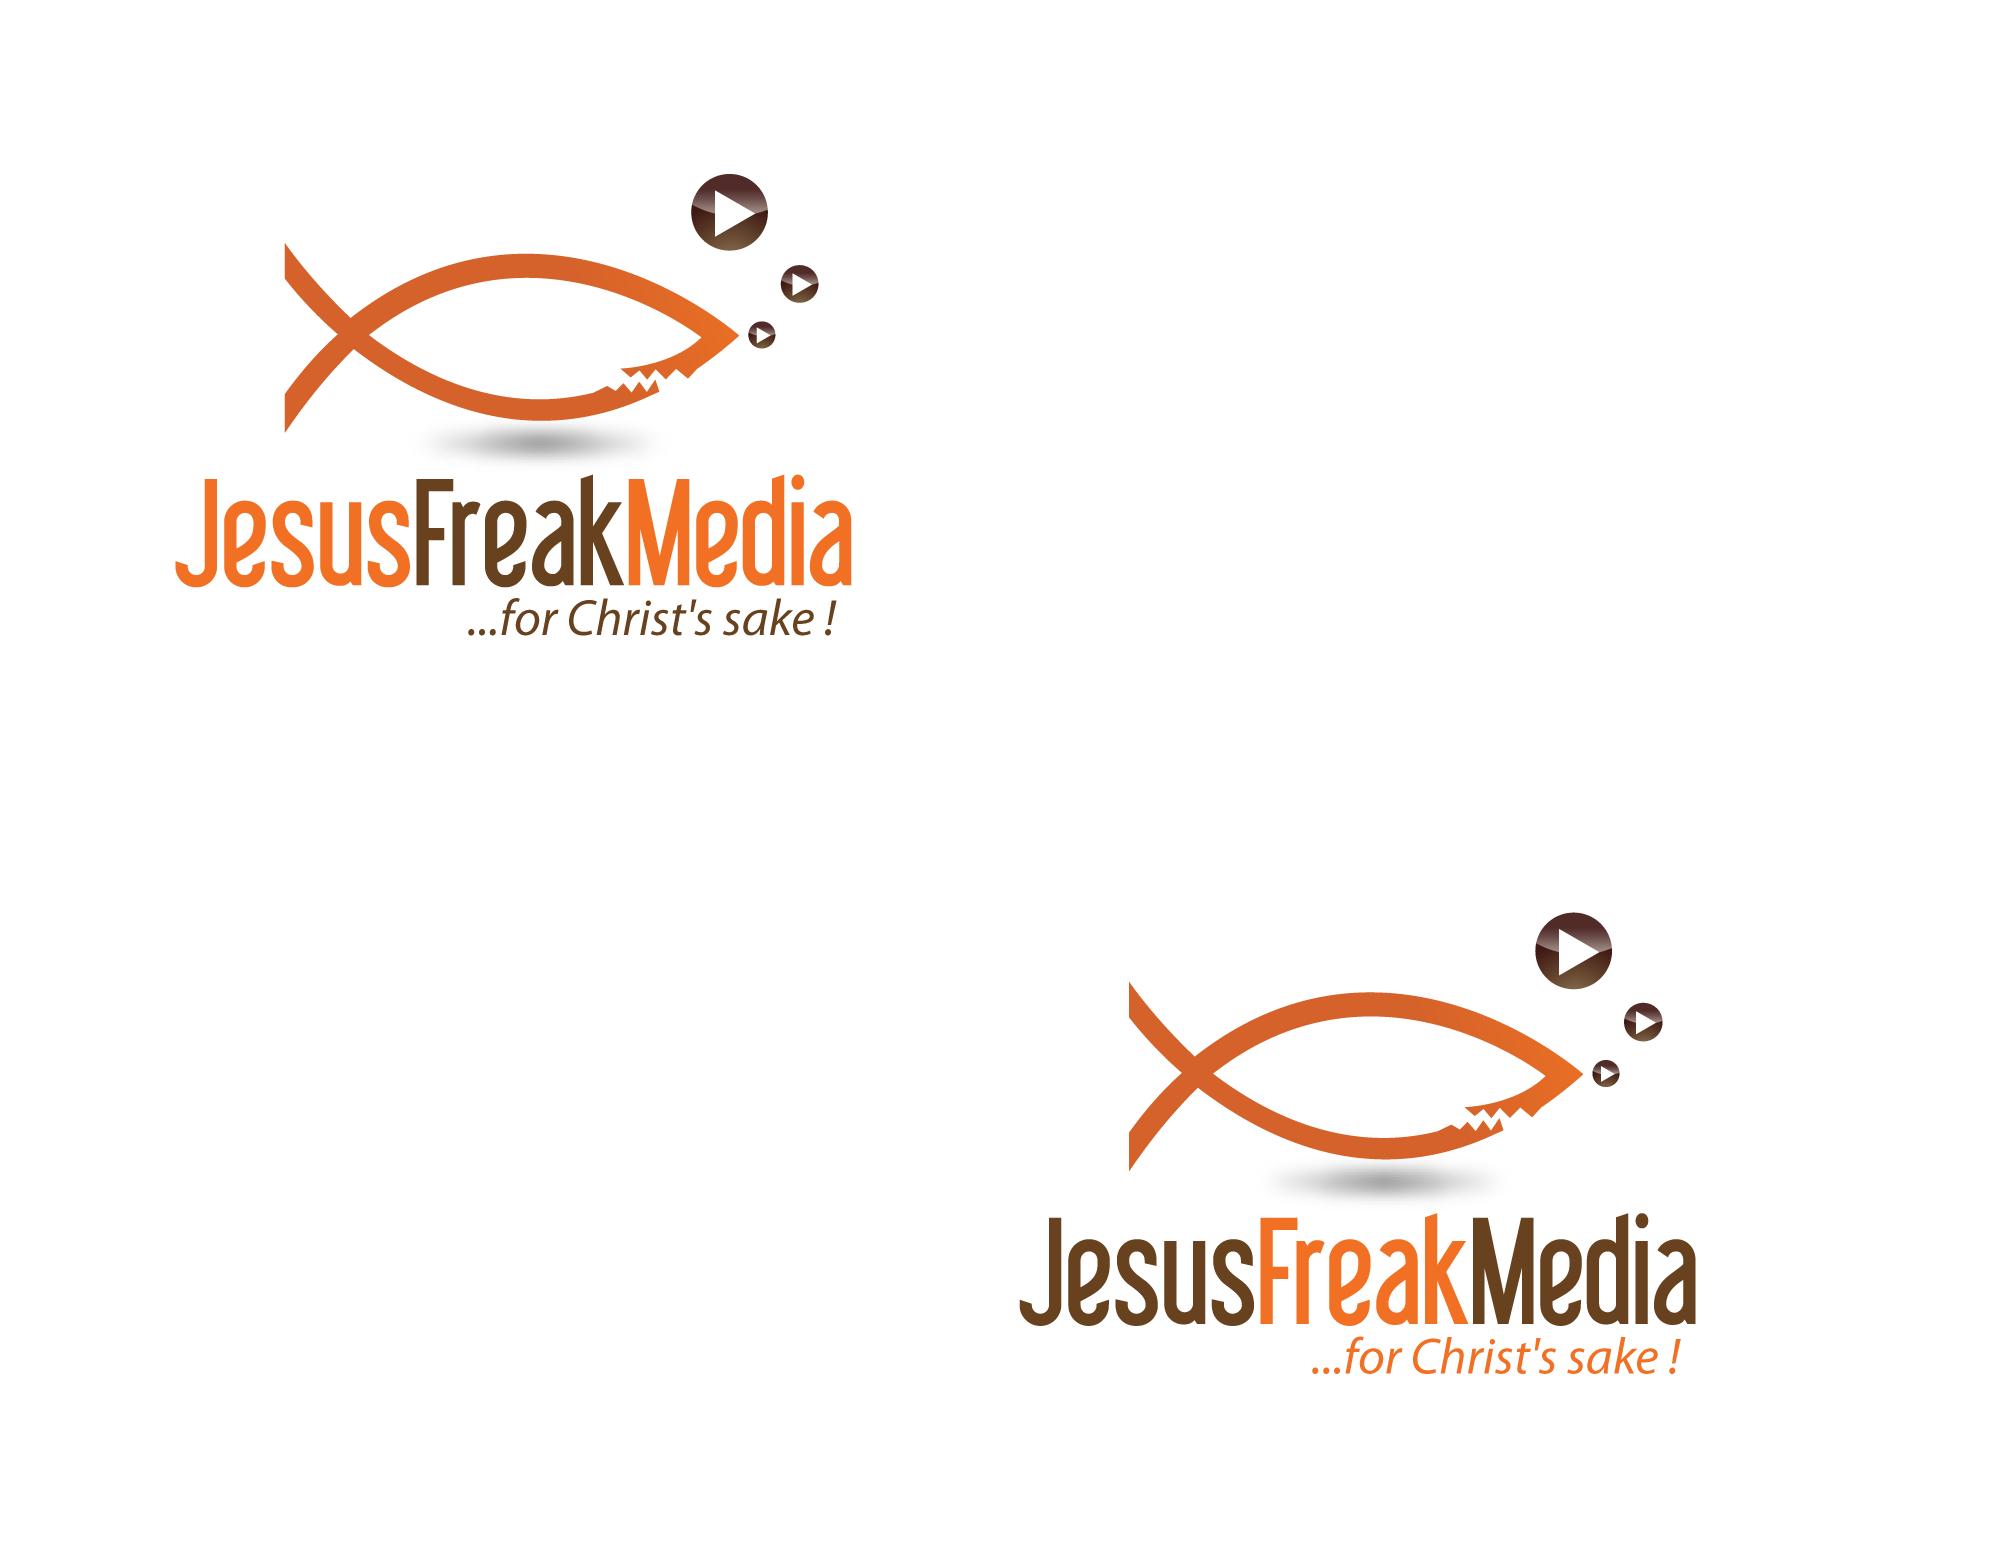 Help Jesus Freak Media  (for Christ's sake) with a new logo